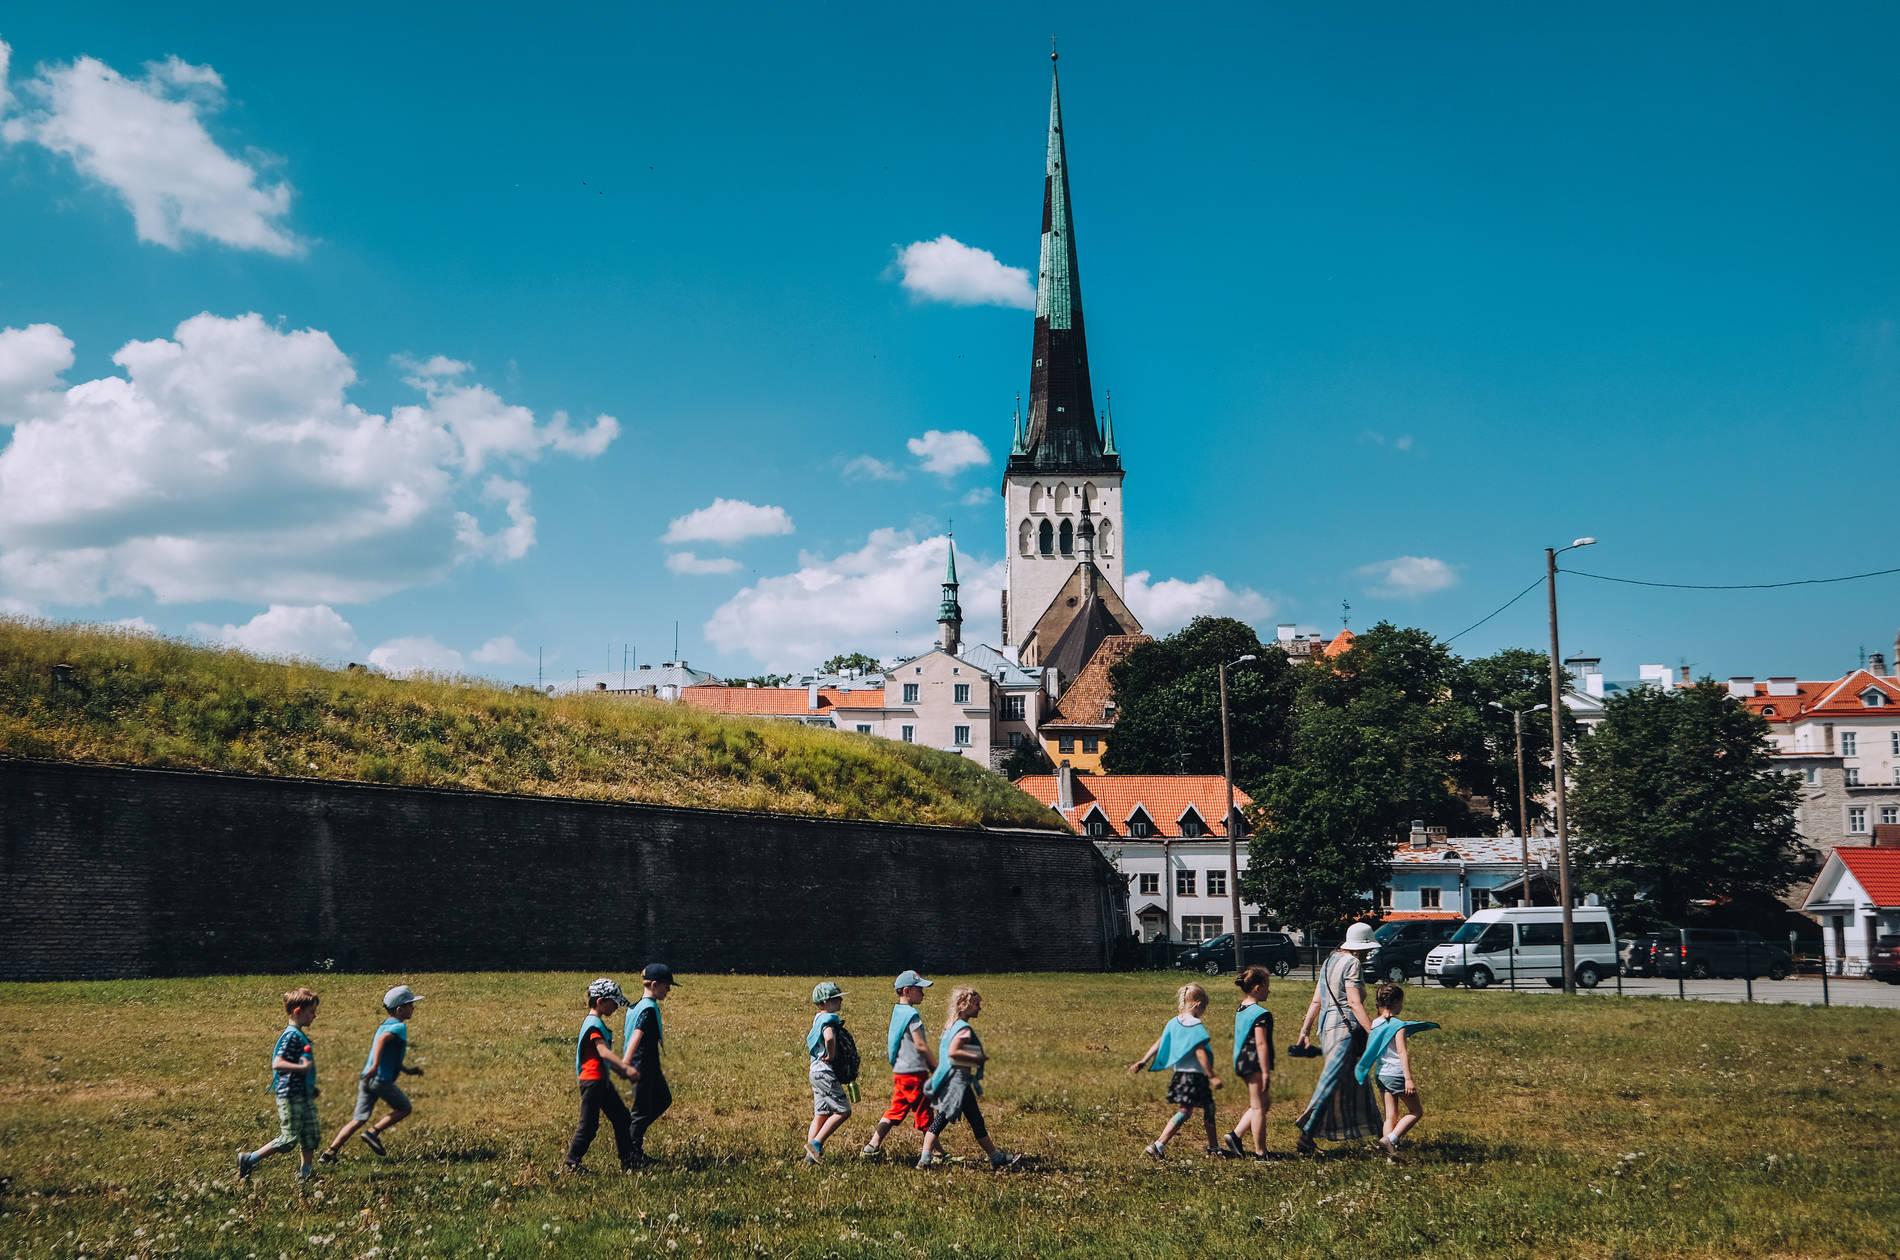 Children in the greenery of Tallinn Photo by: Kadi-Liis Koppel